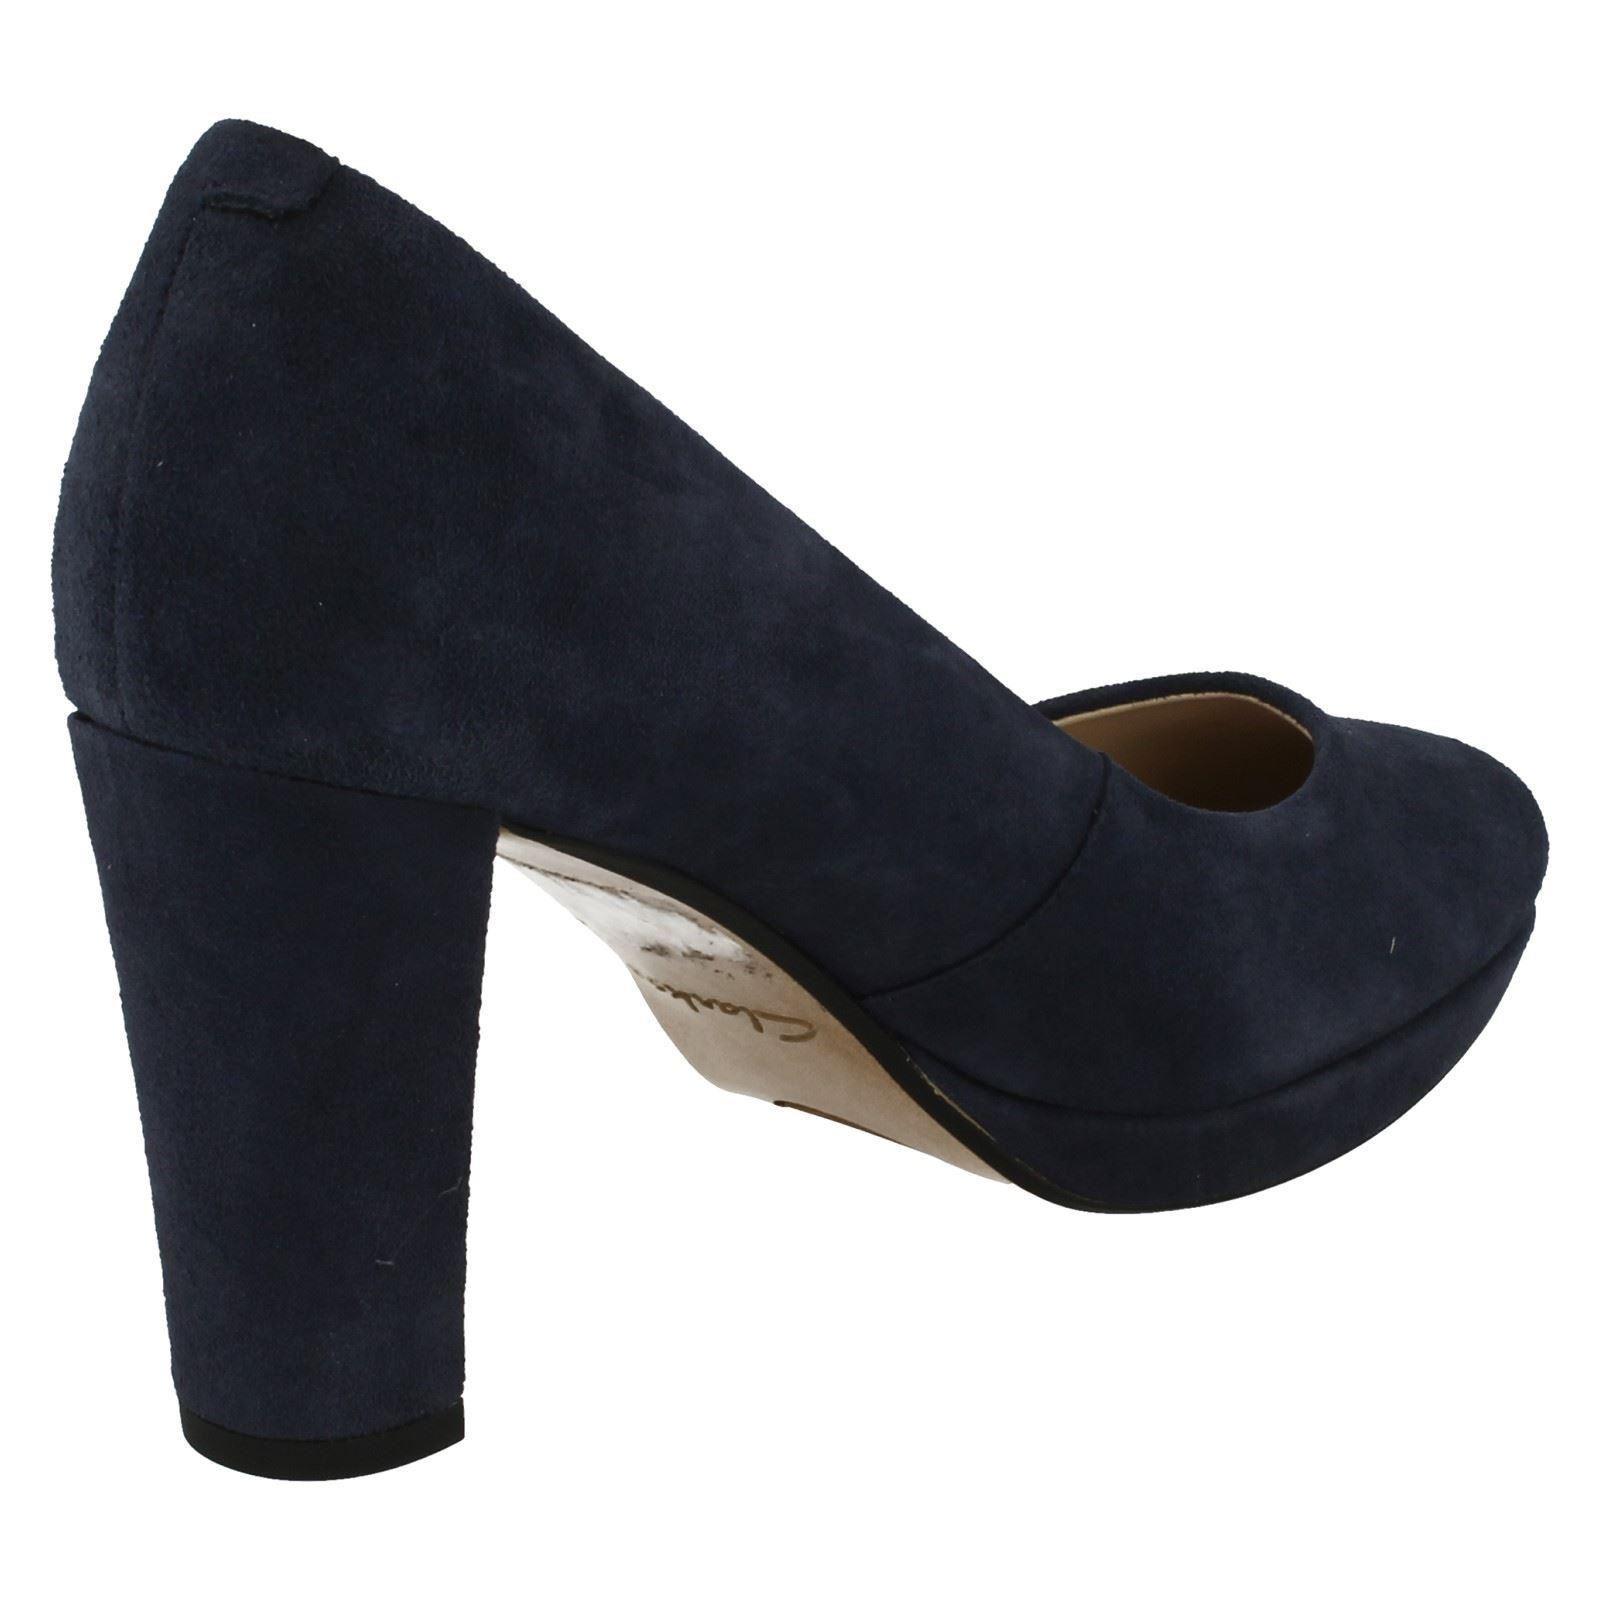 Heeled High Fashion Ebay Ladies Sienna Shoes Clarks Kendra qFwP674P